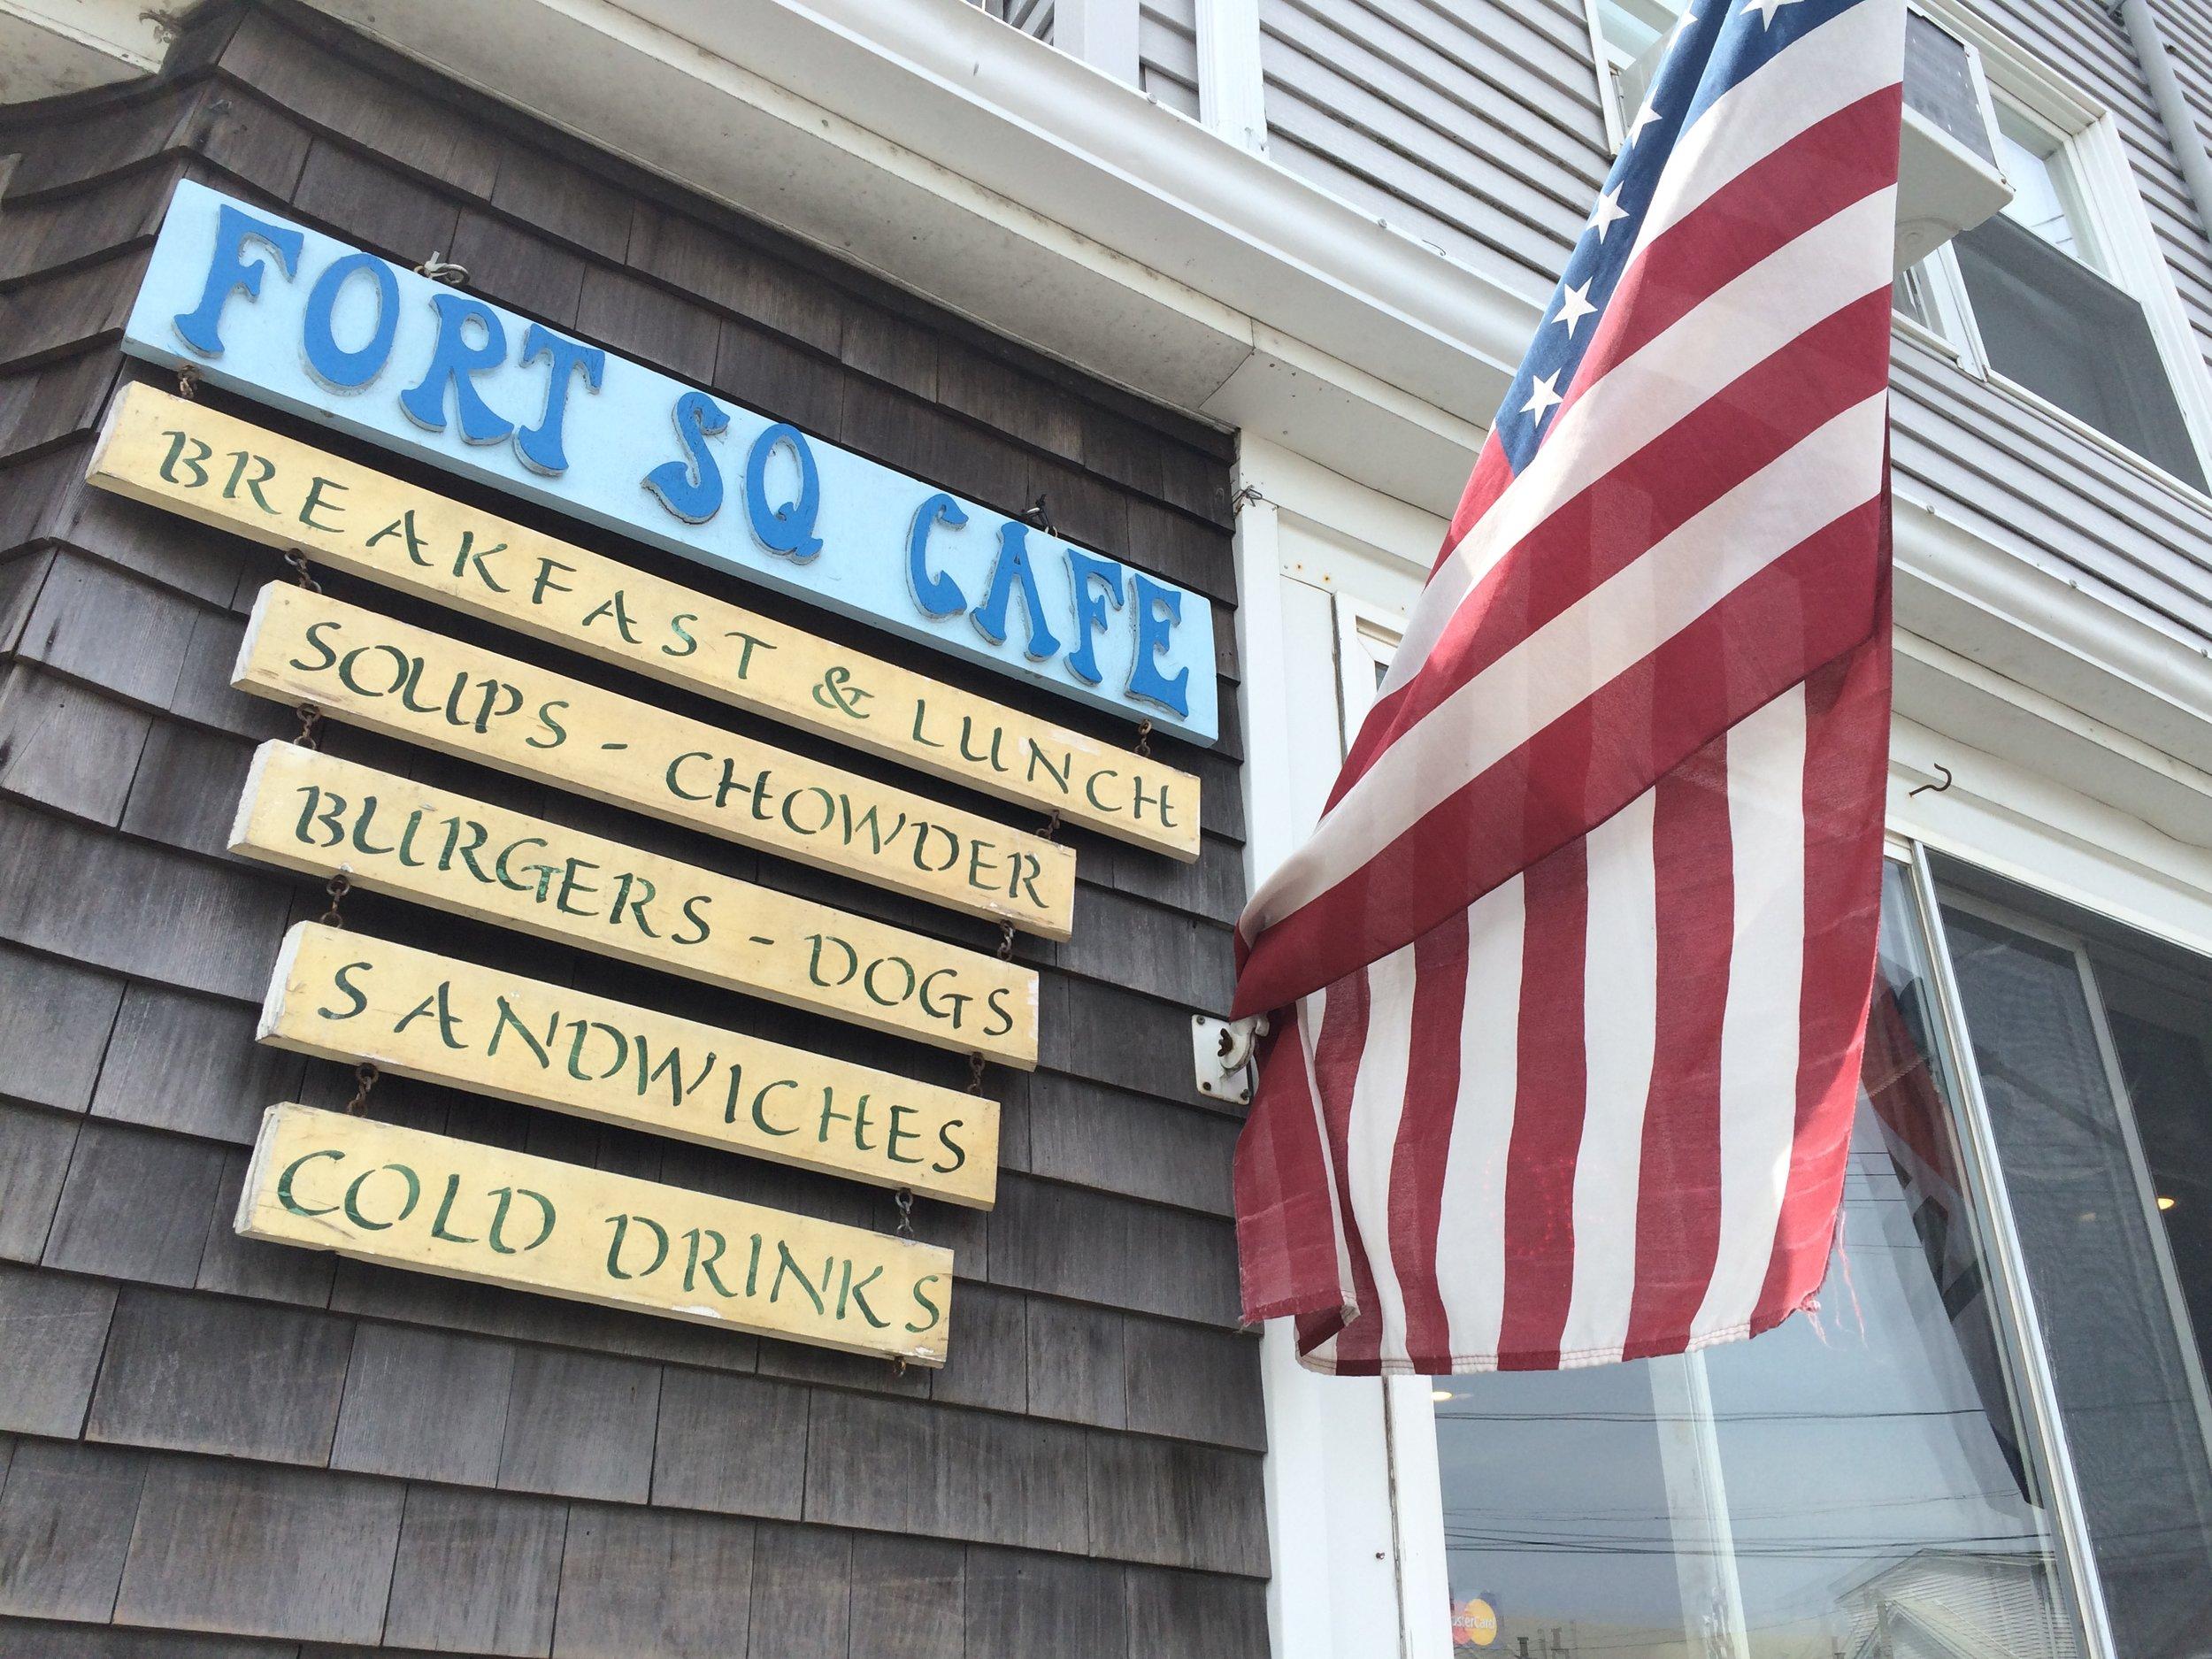 Fort Square Cafe